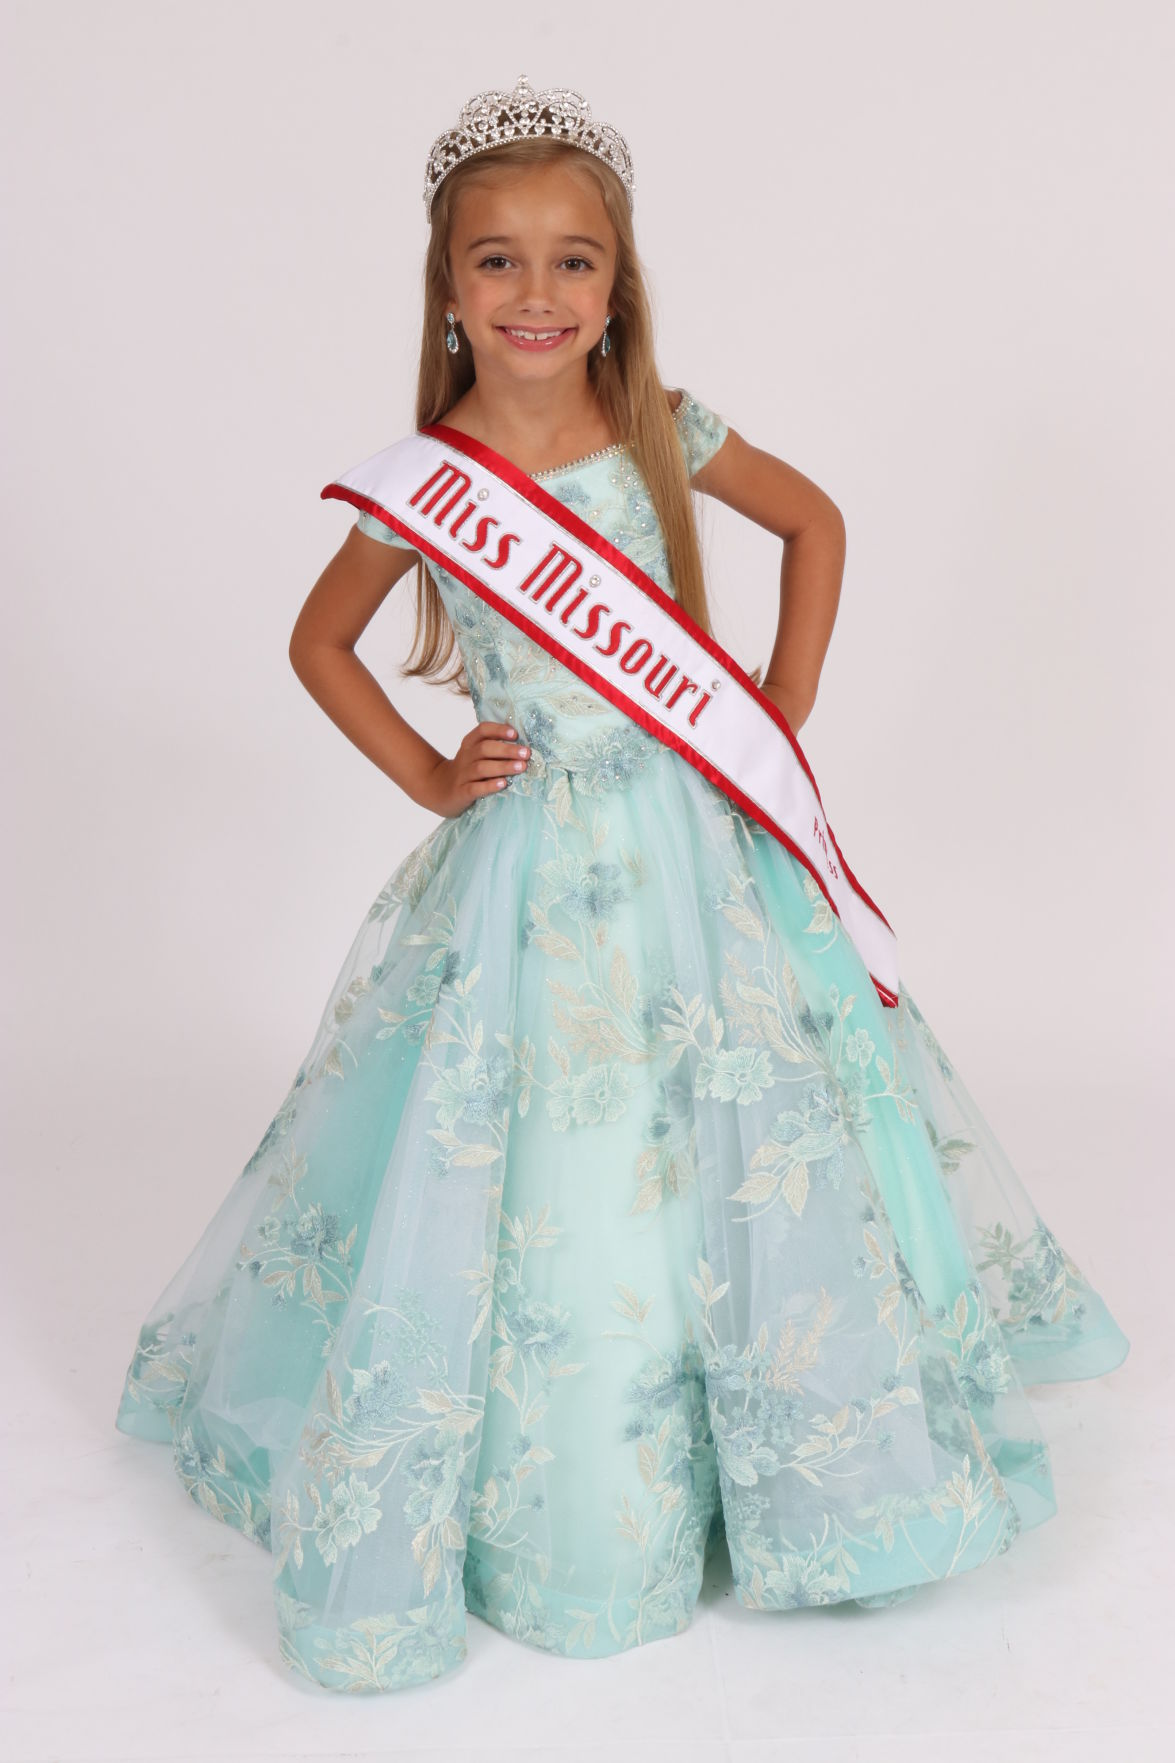 Smithville native crowned Miss Missouri Princess